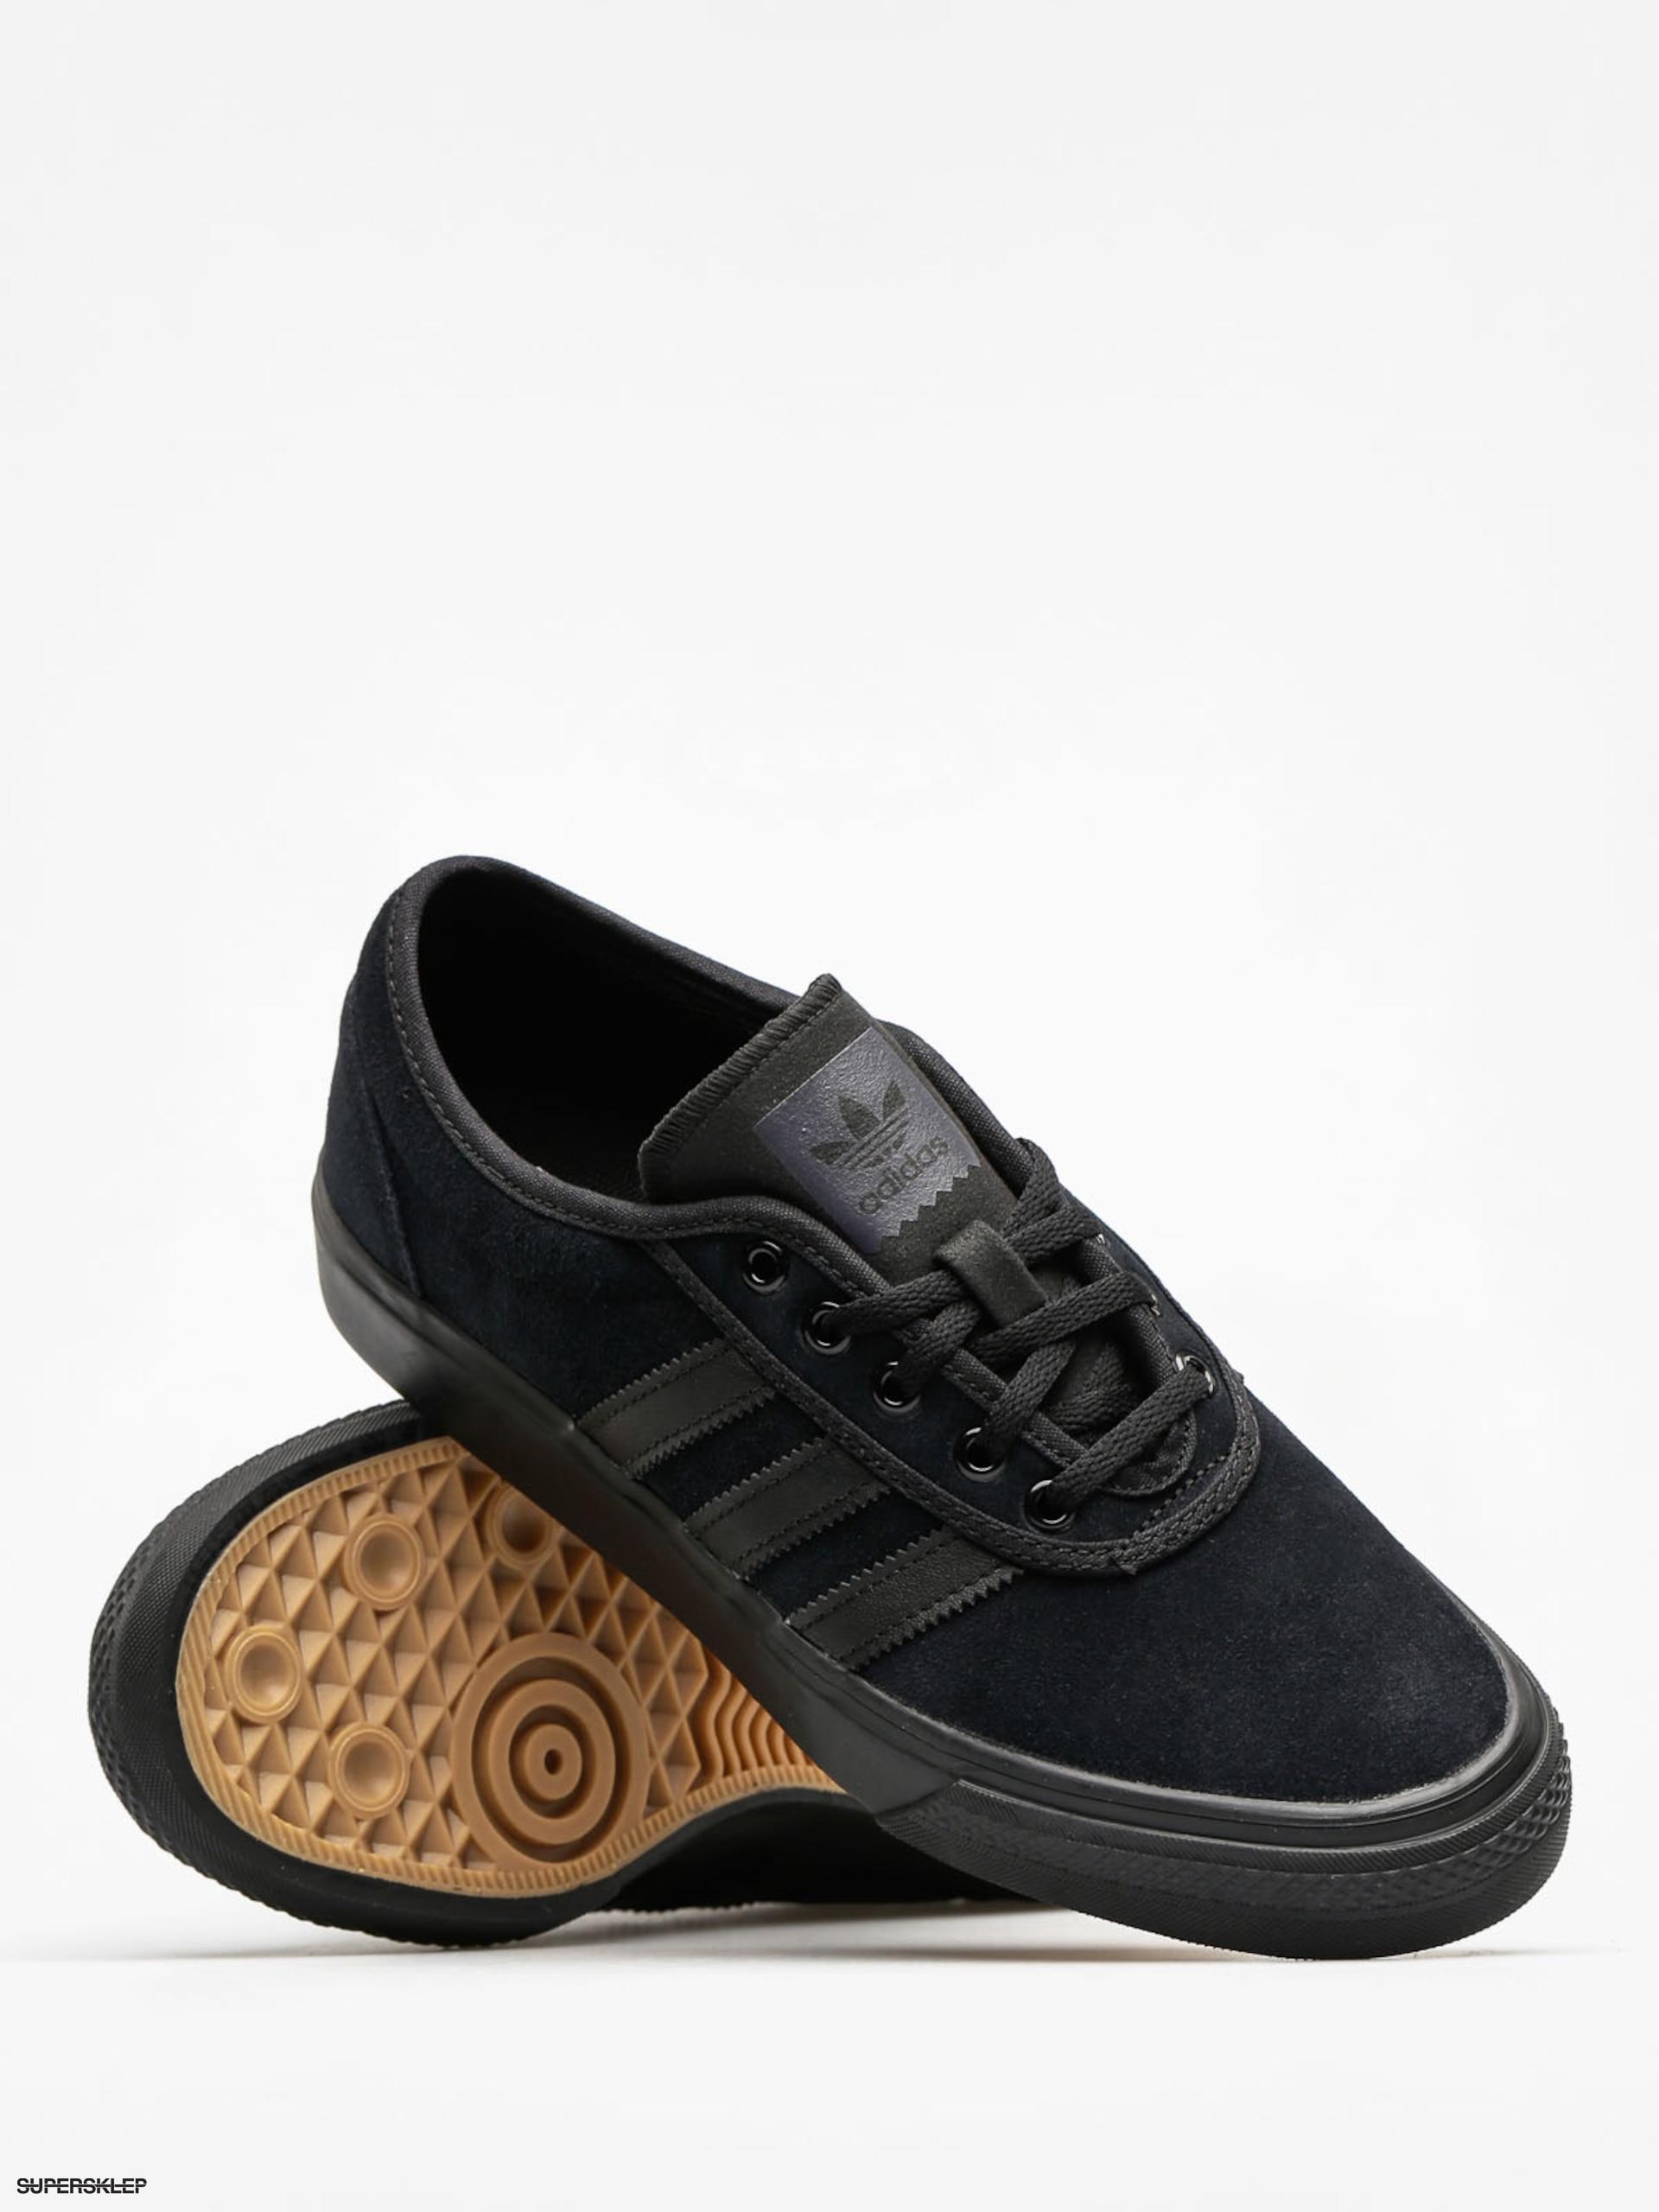 49e02d7dfbbec Topánky adidas Adi Ease (core black/core black/core black)